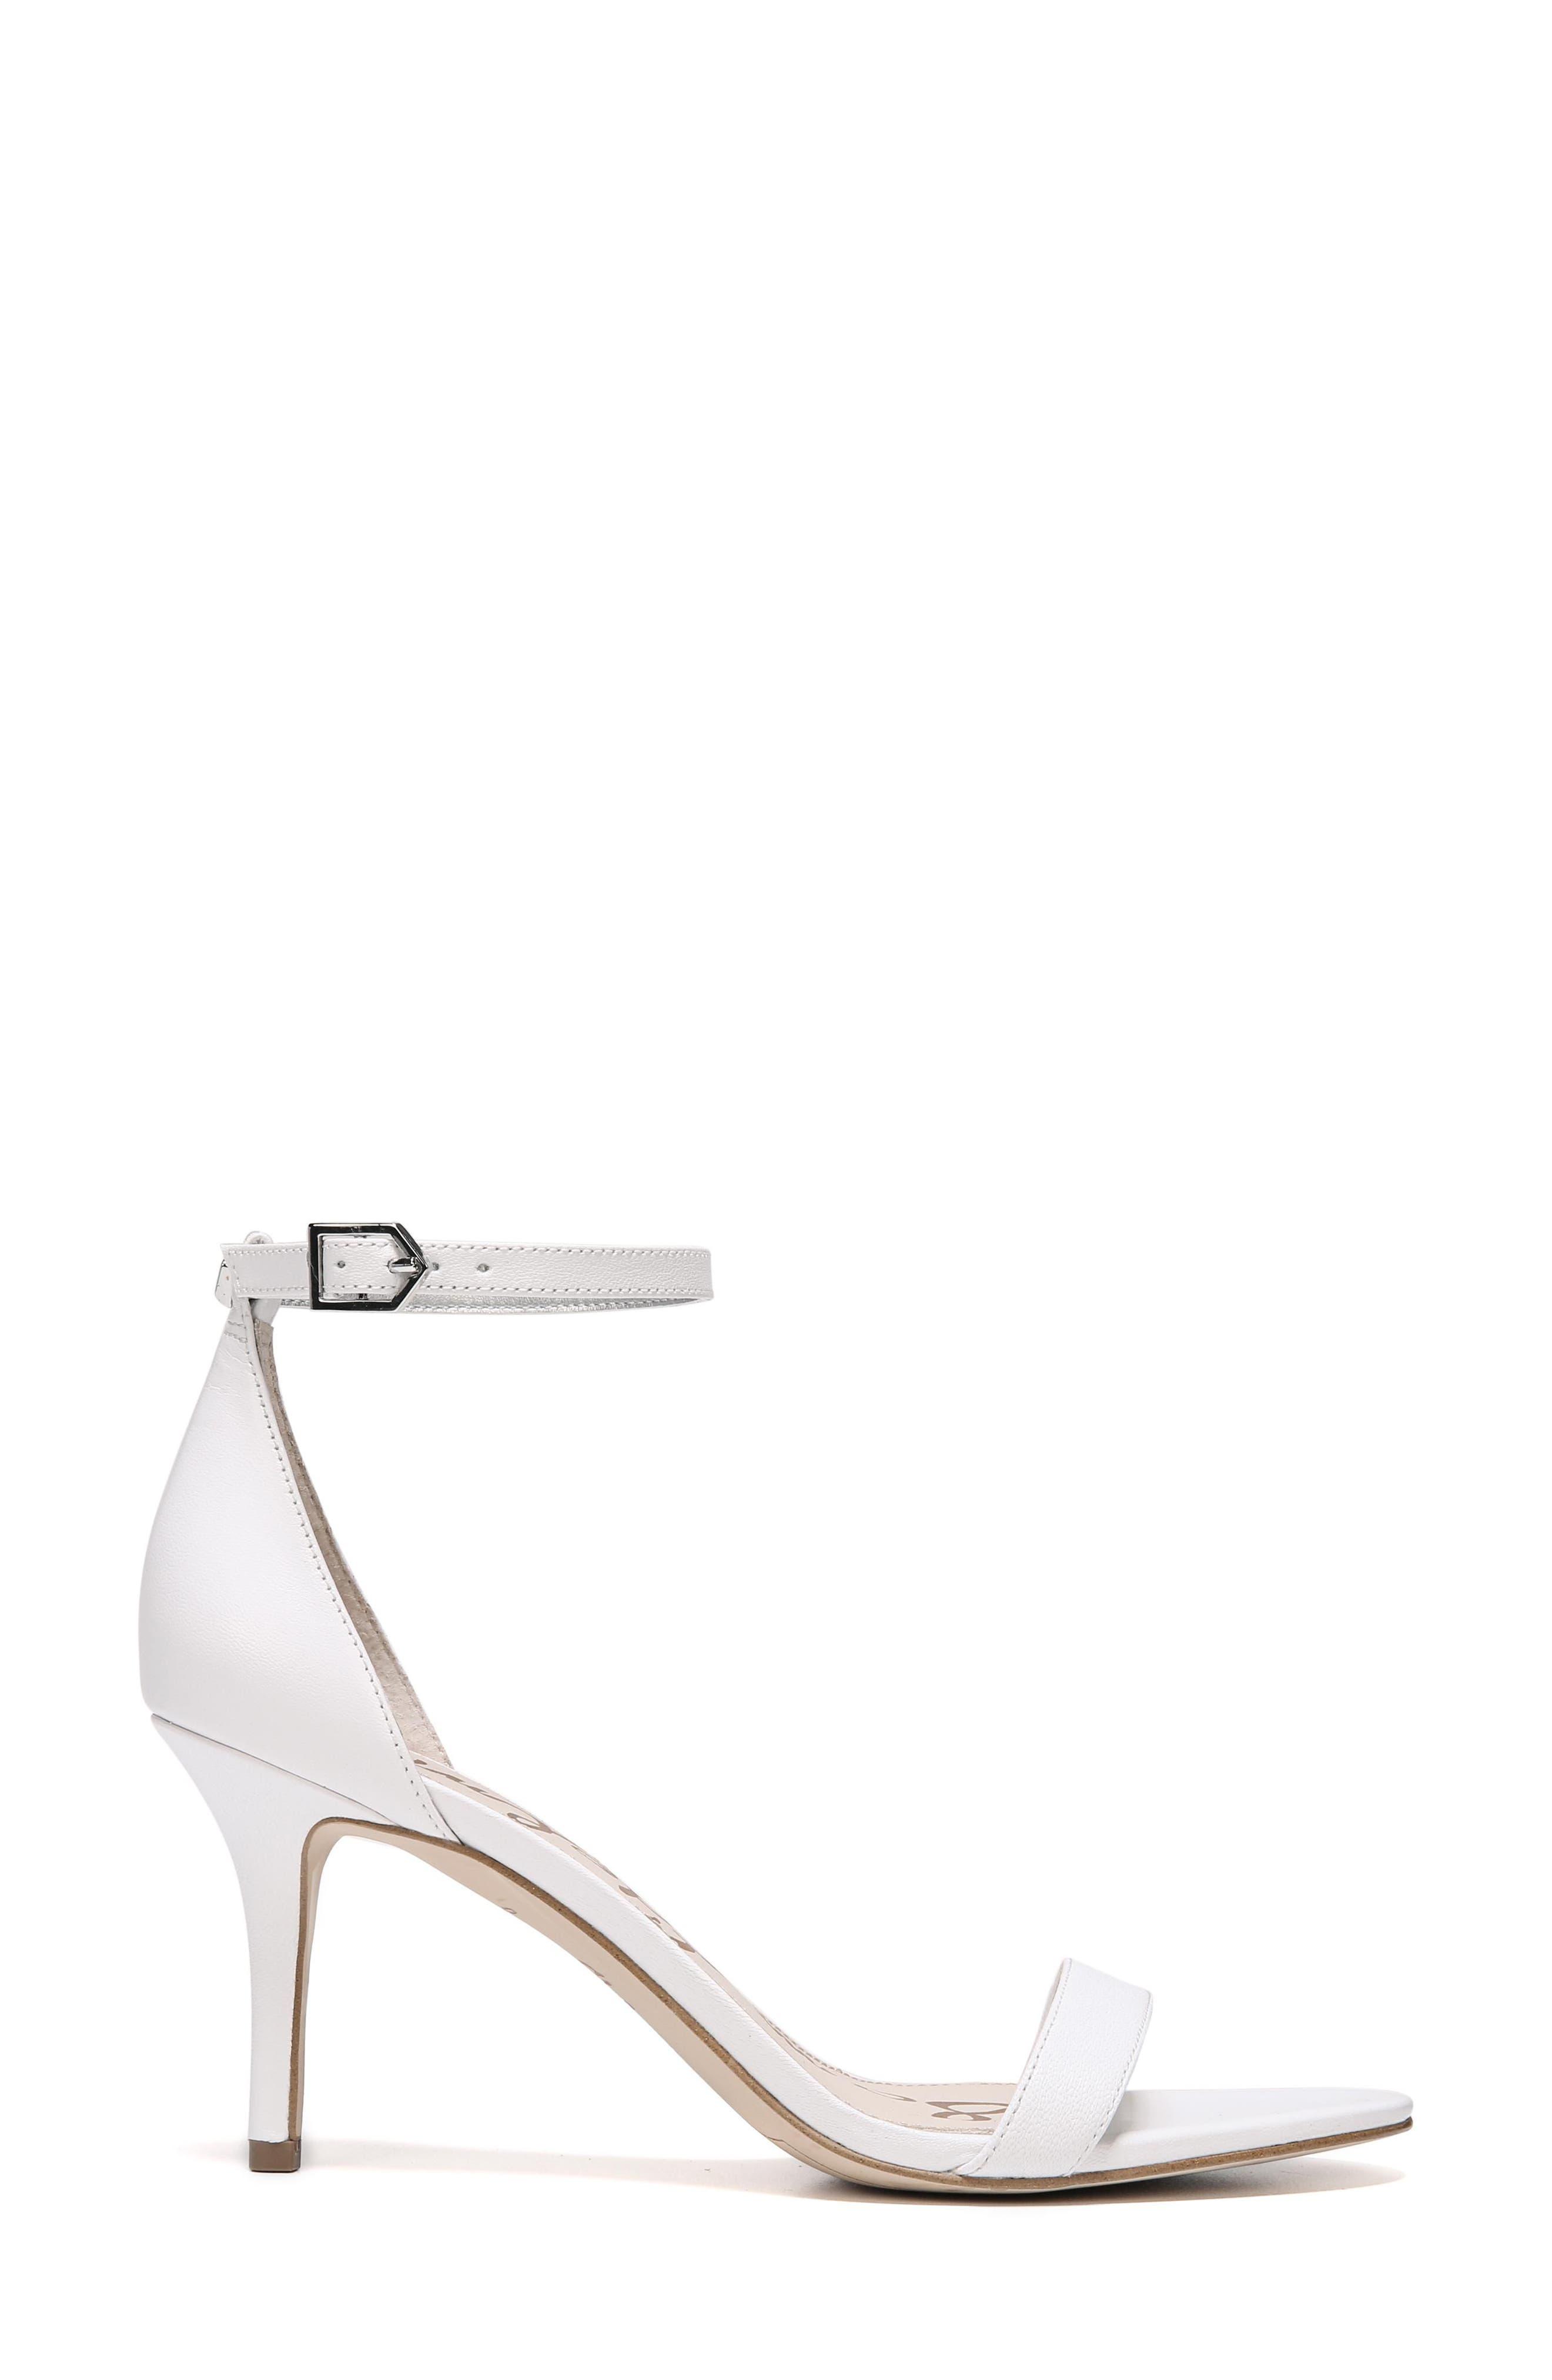 ,                             'Patti' Ankle Strap Sandal,                             Alternate thumbnail 58, color,                             101